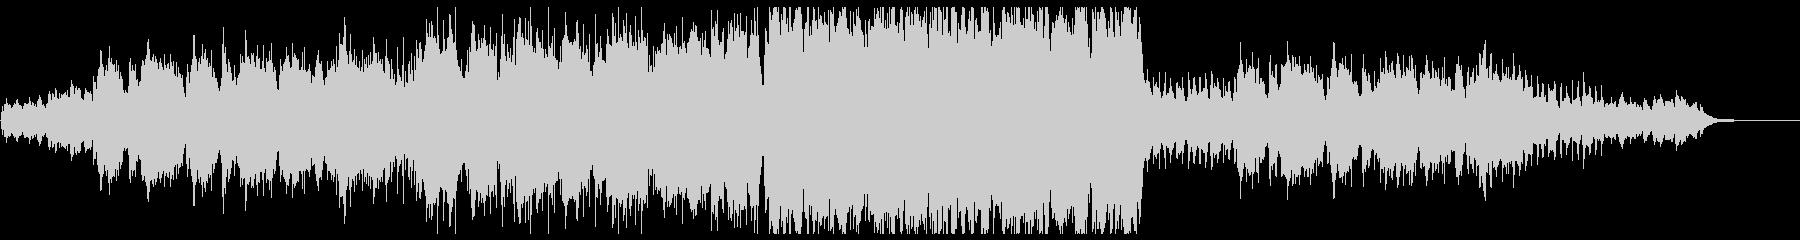 【MIX2】穏やかでノリの良い牧歌的な…の未再生の波形